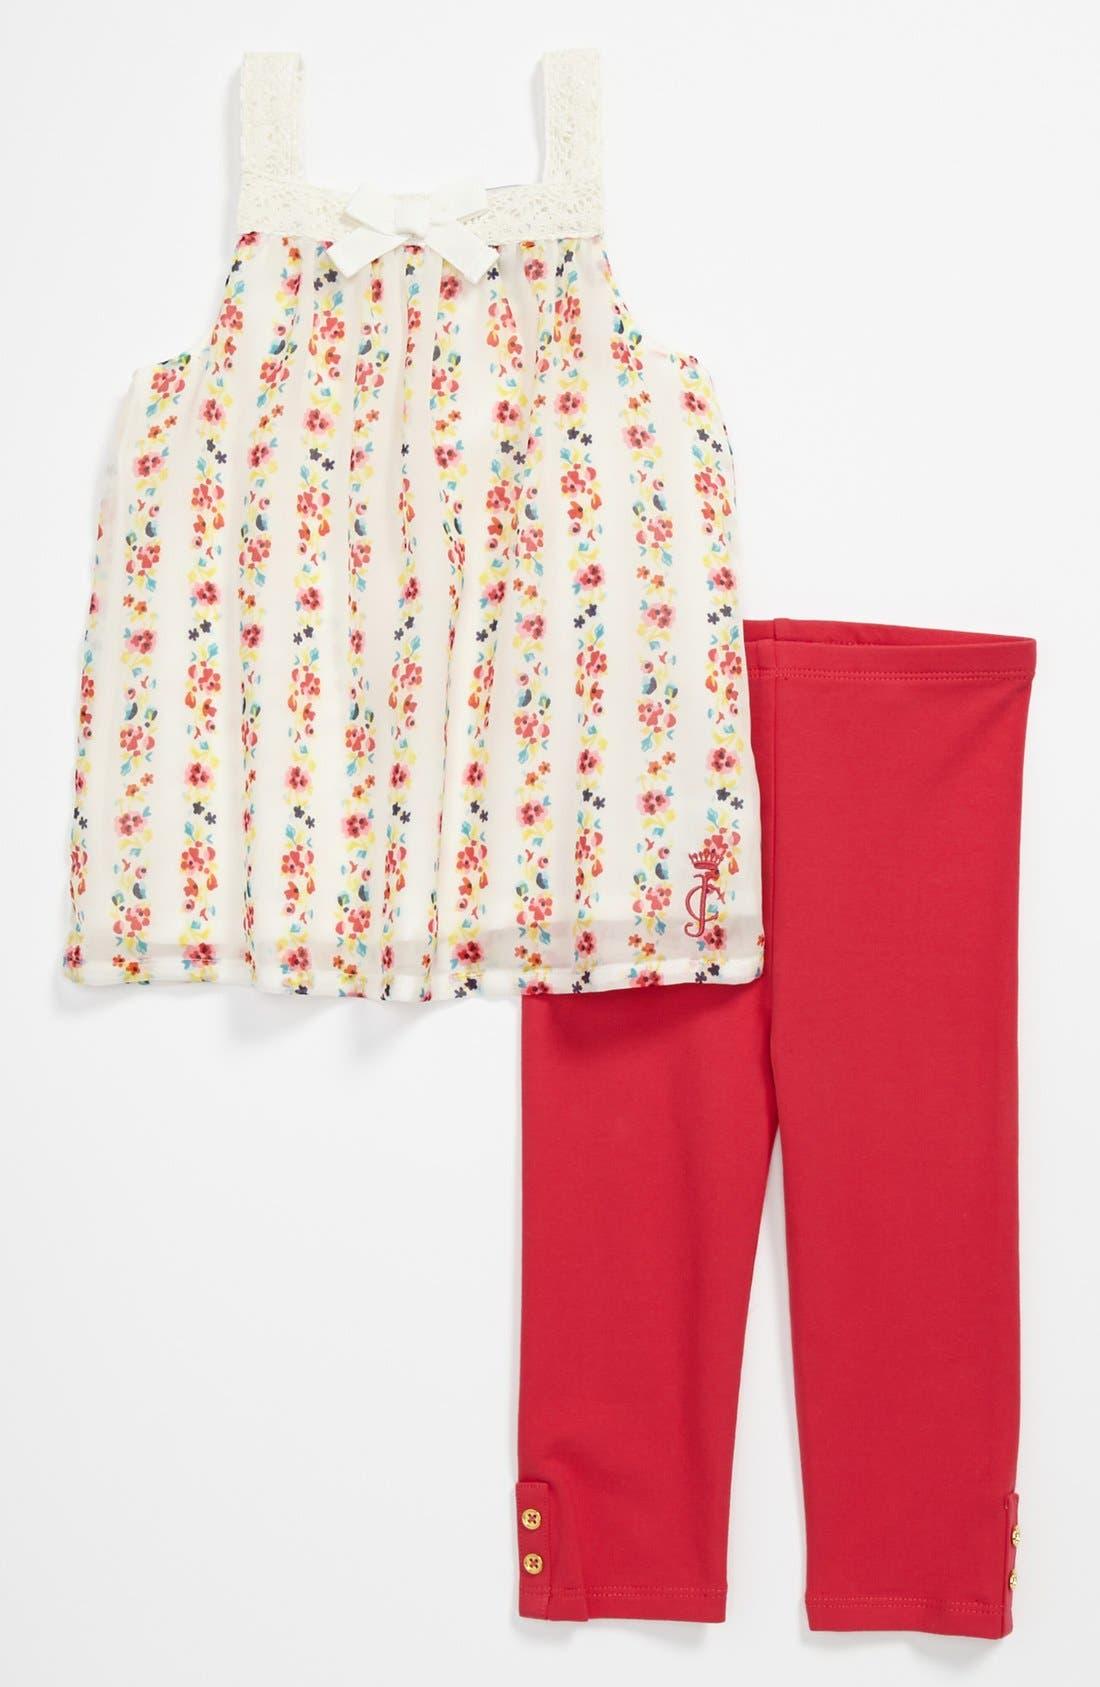 Alternate Image 1 Selected - Juicy Couture Tank Top & Leggings (Baby Girls)